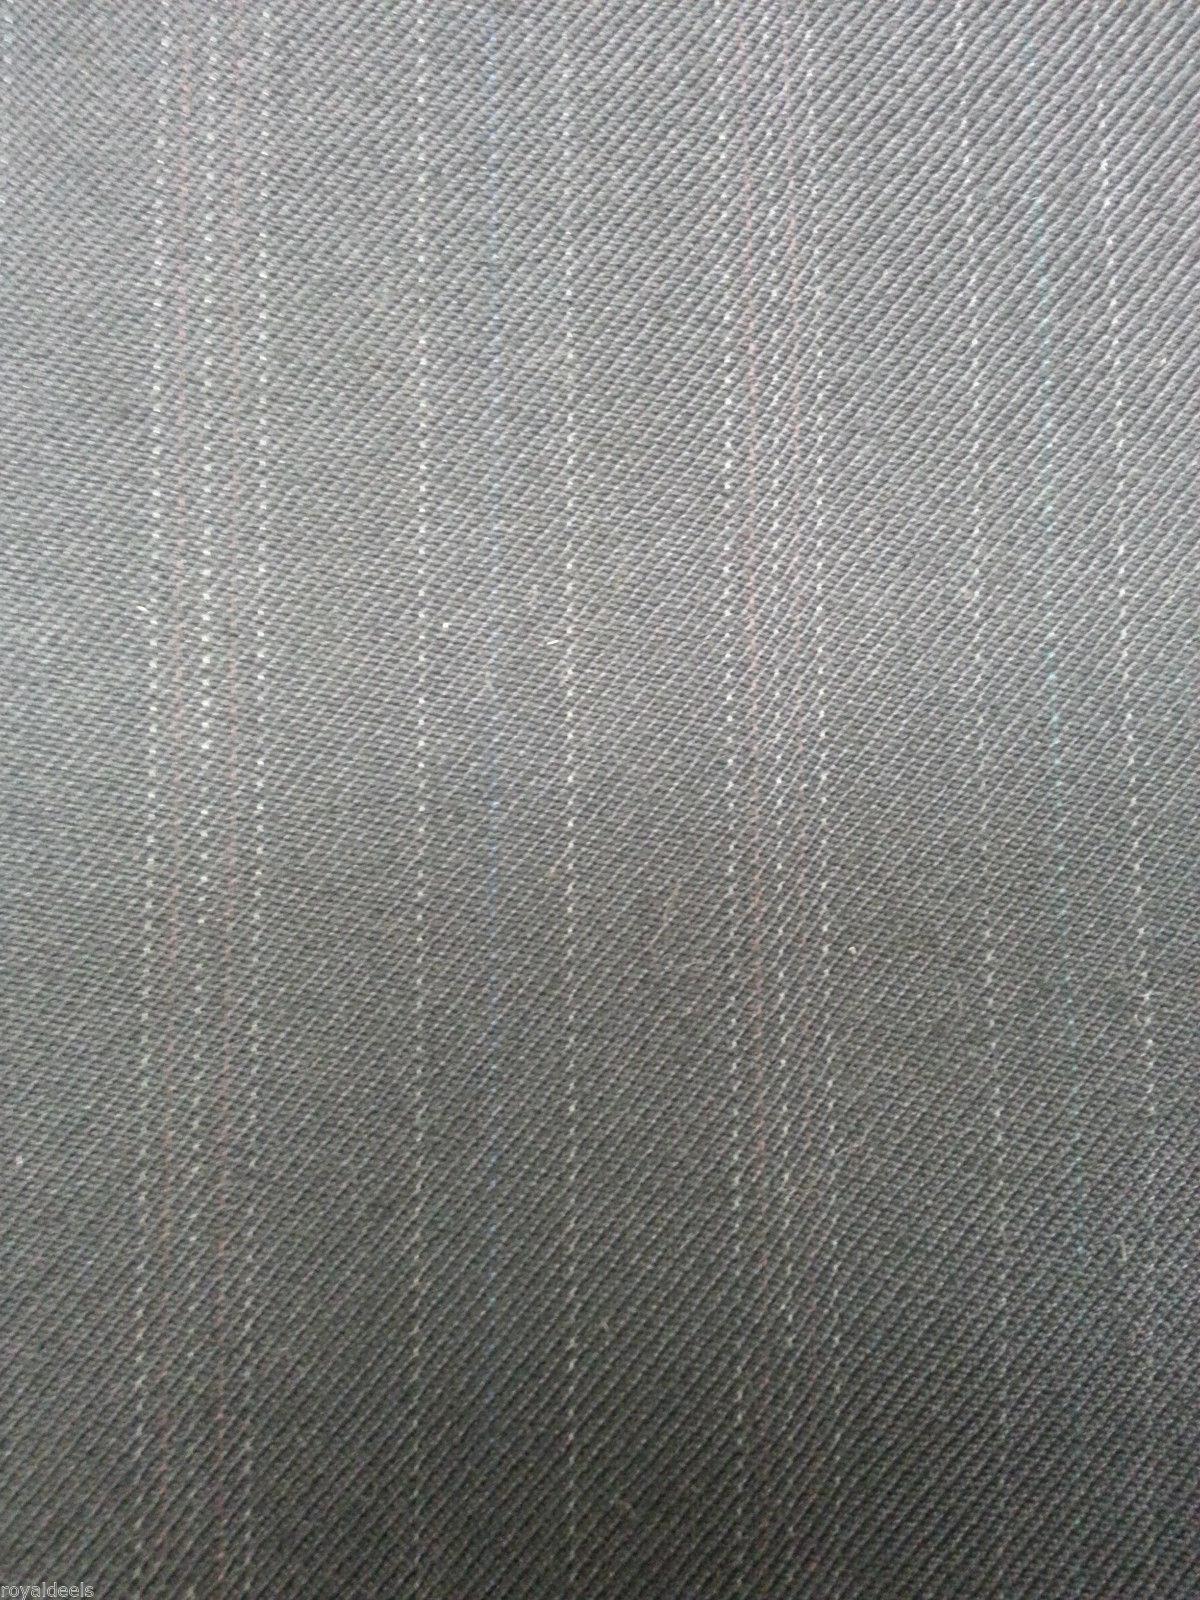 9+ YRD NAVY BLUE ENGLISH WOOL Pin Stripe Suit Skirt Jacket Fashion Sewing Fabric